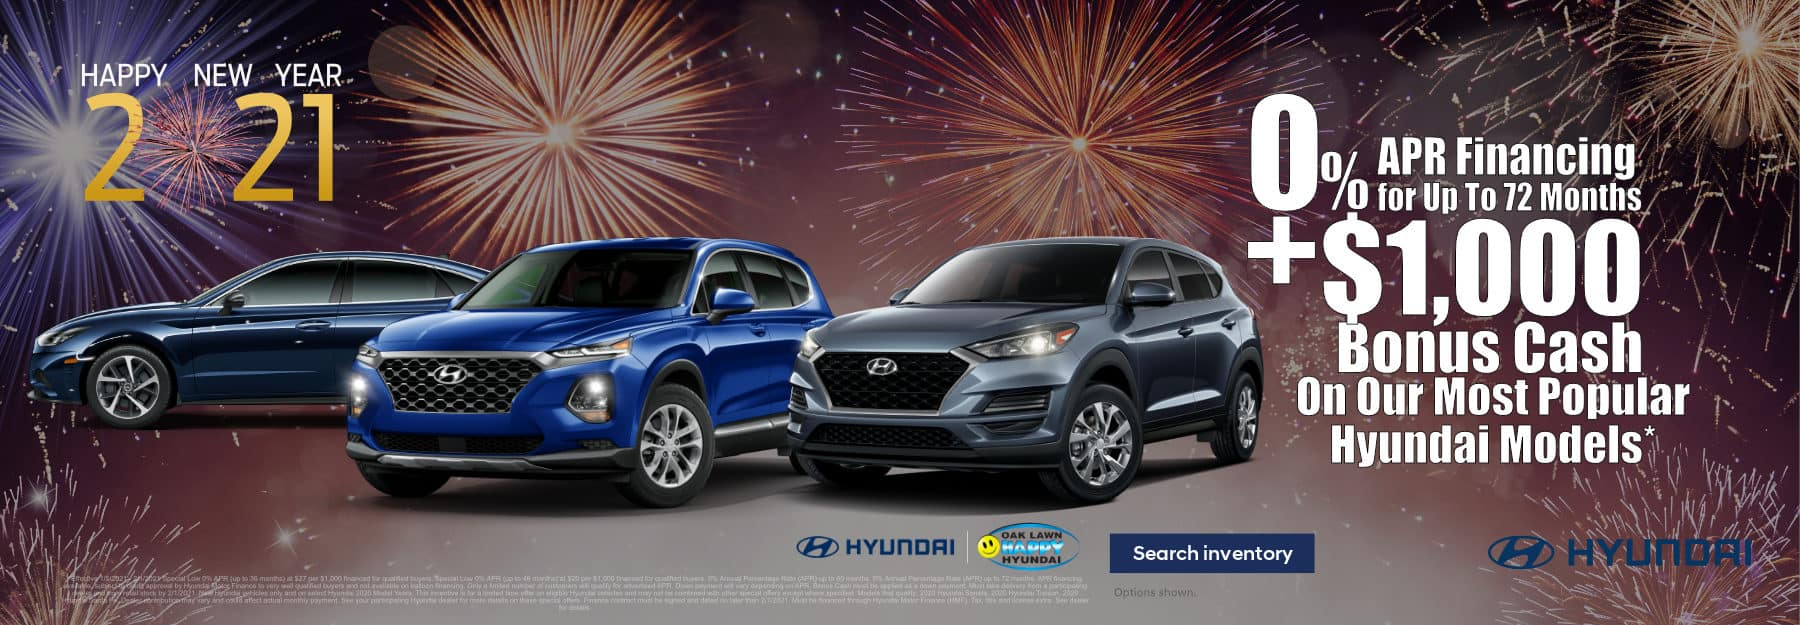 January_2021_General_Happy_Hyundai